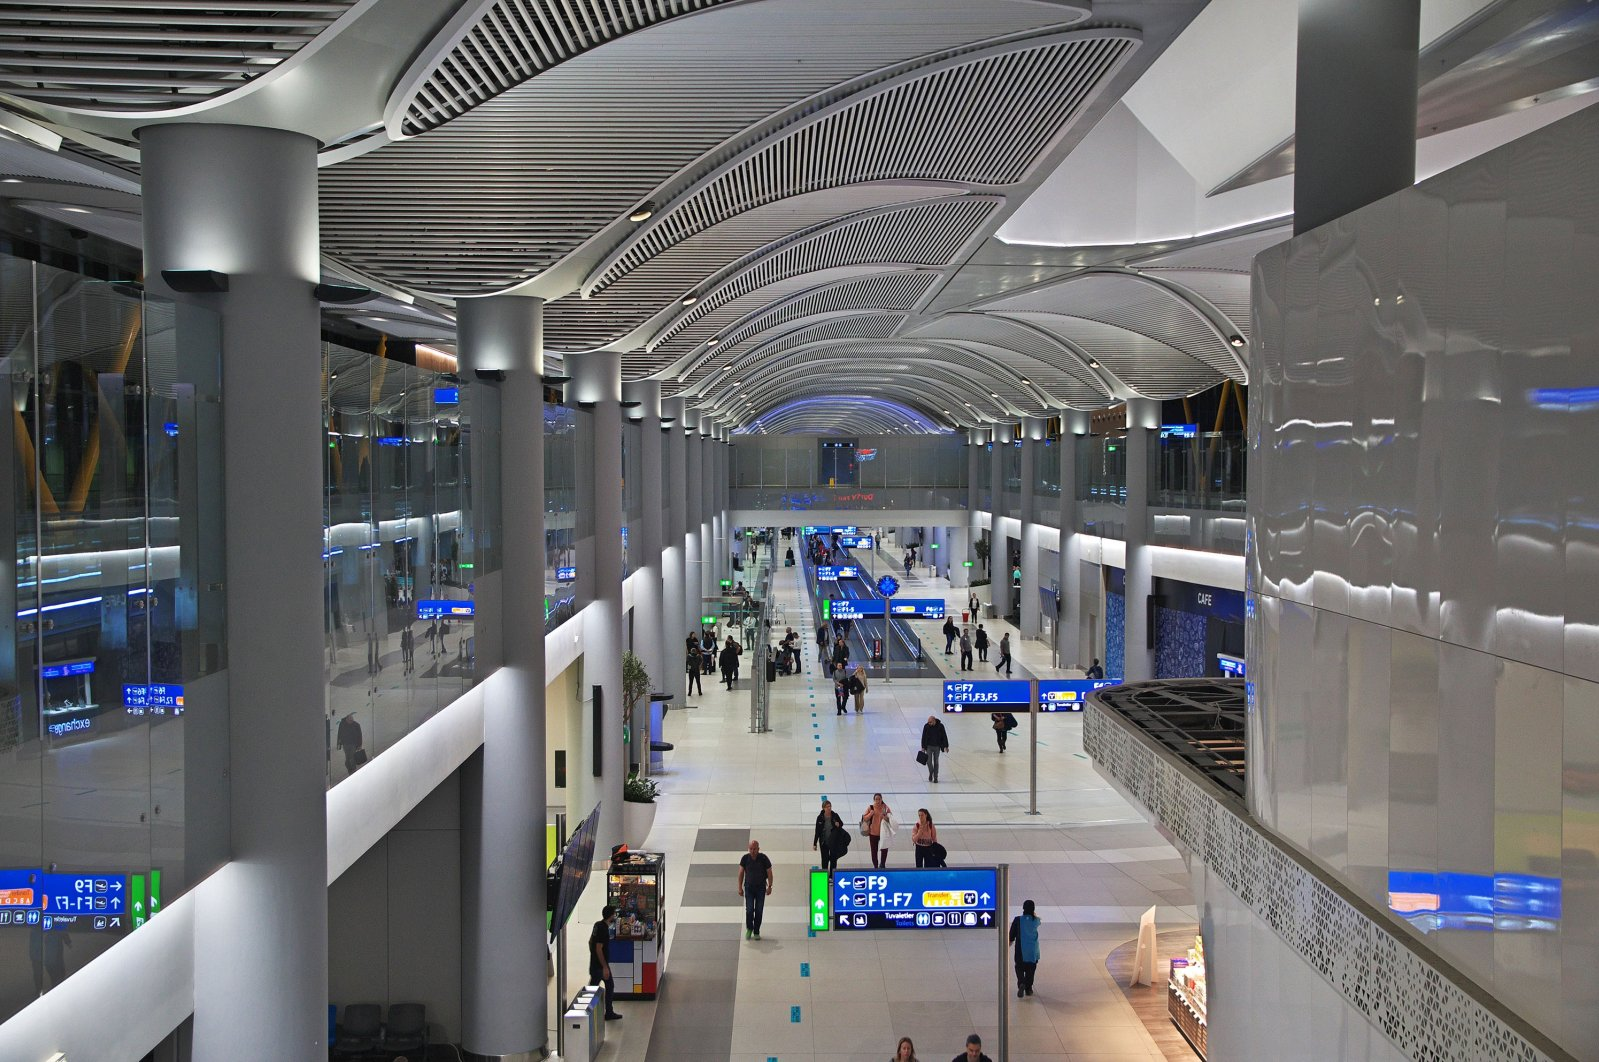 Passengers walk in the Istanbul Airport, Istanbul, Turkey, Dec. 12, 2019. (Shutterstock Photo)